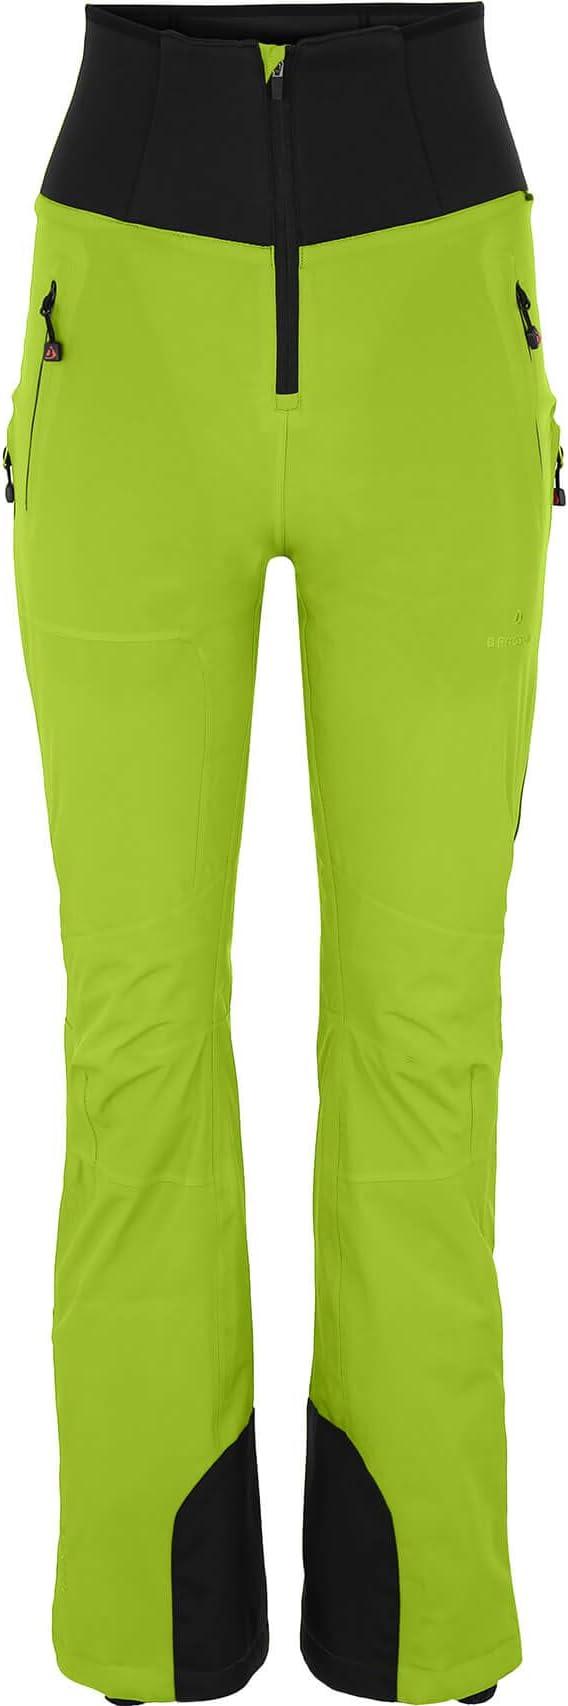 Damen 242 Lime Green Bergson Damen Skihose Ice Light 34 Slim fit